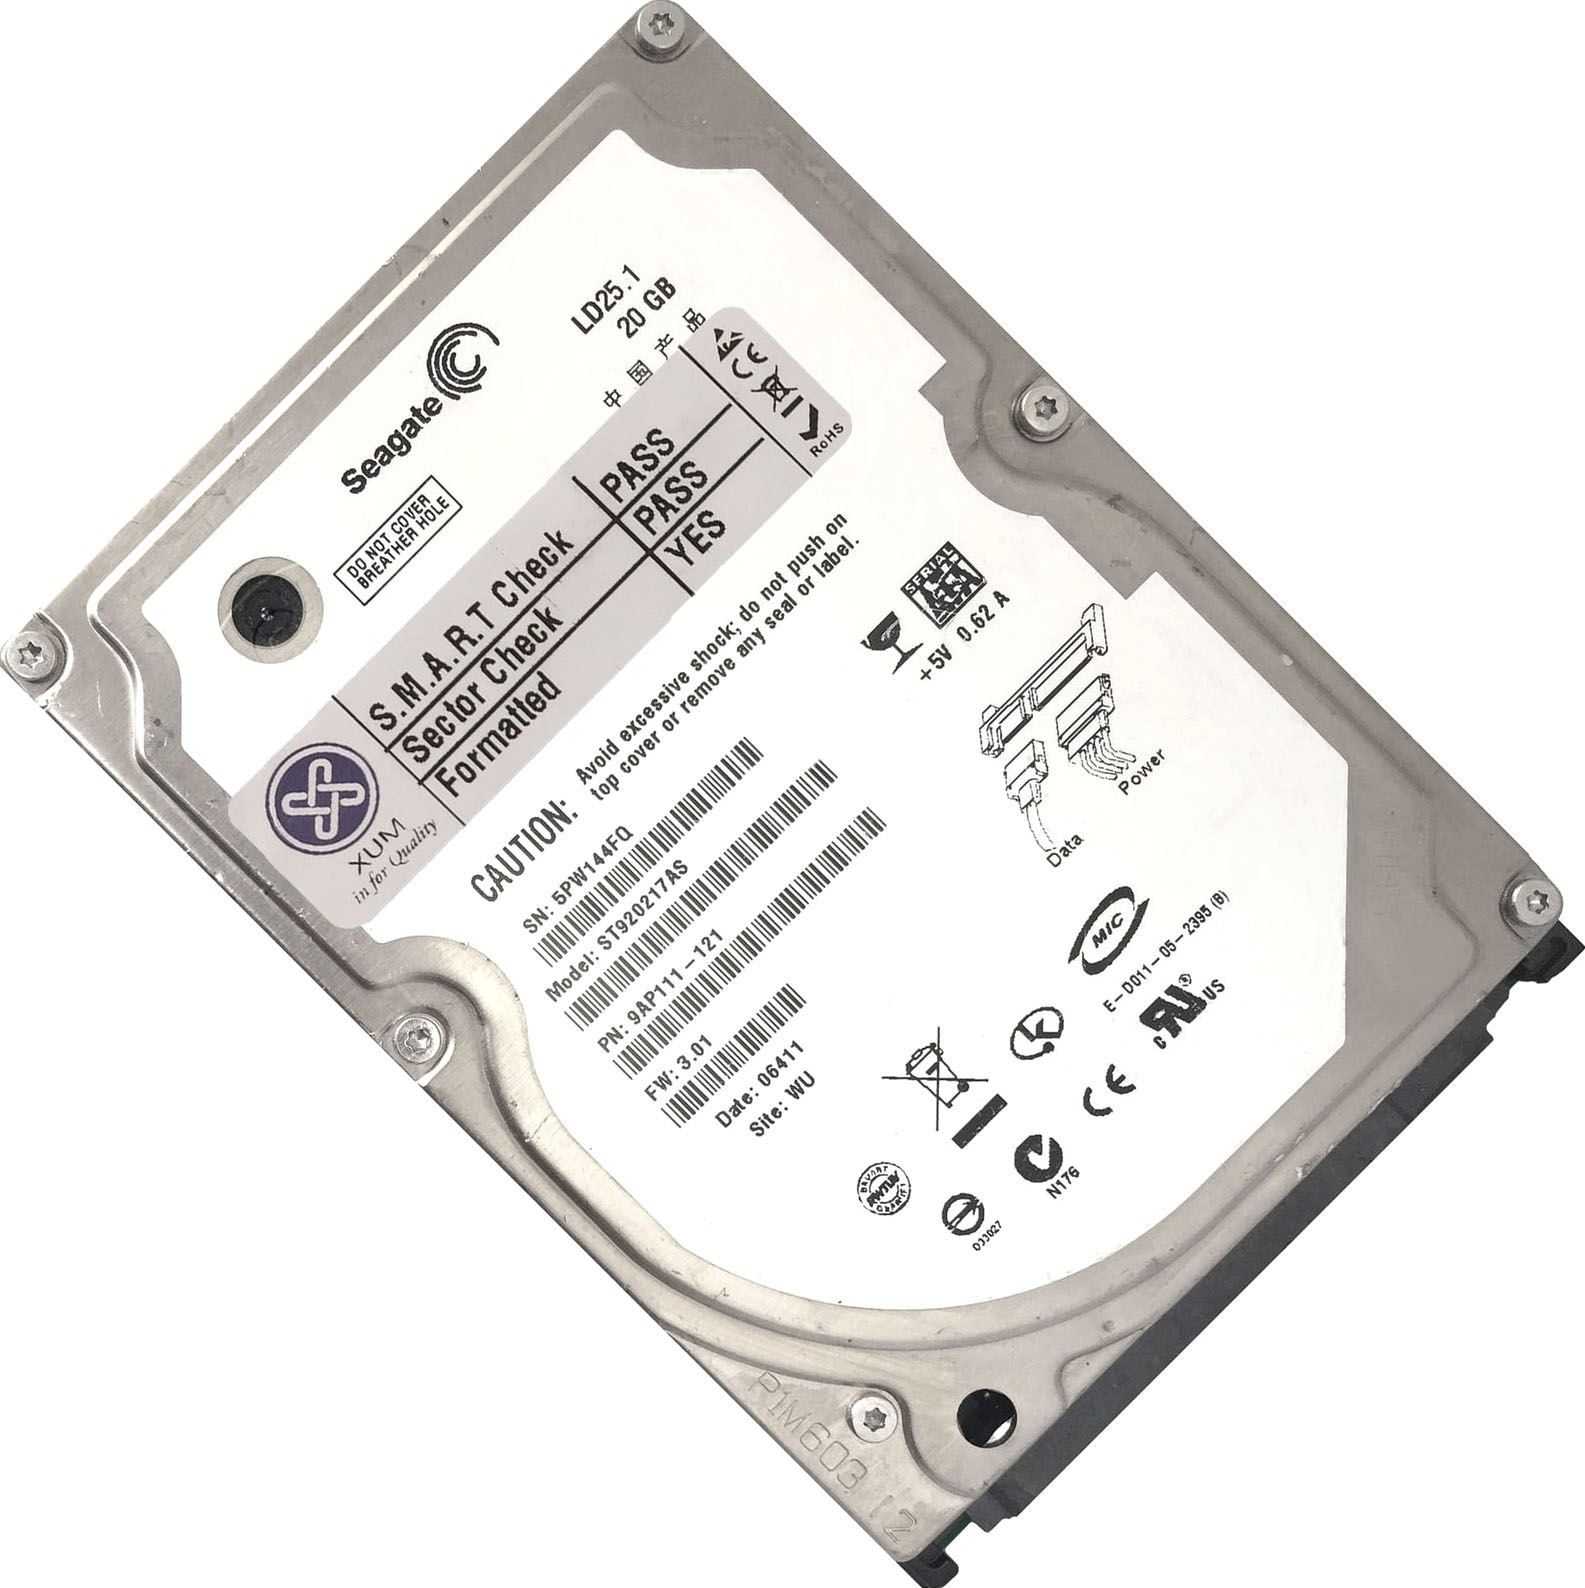 Sata I 25 Internal Hard Disk Drives Ebay Hardisk Notebook Toshiba 1tb Inch 5400rpm 15gb S 2mb Cache Drive Hdd Laptop